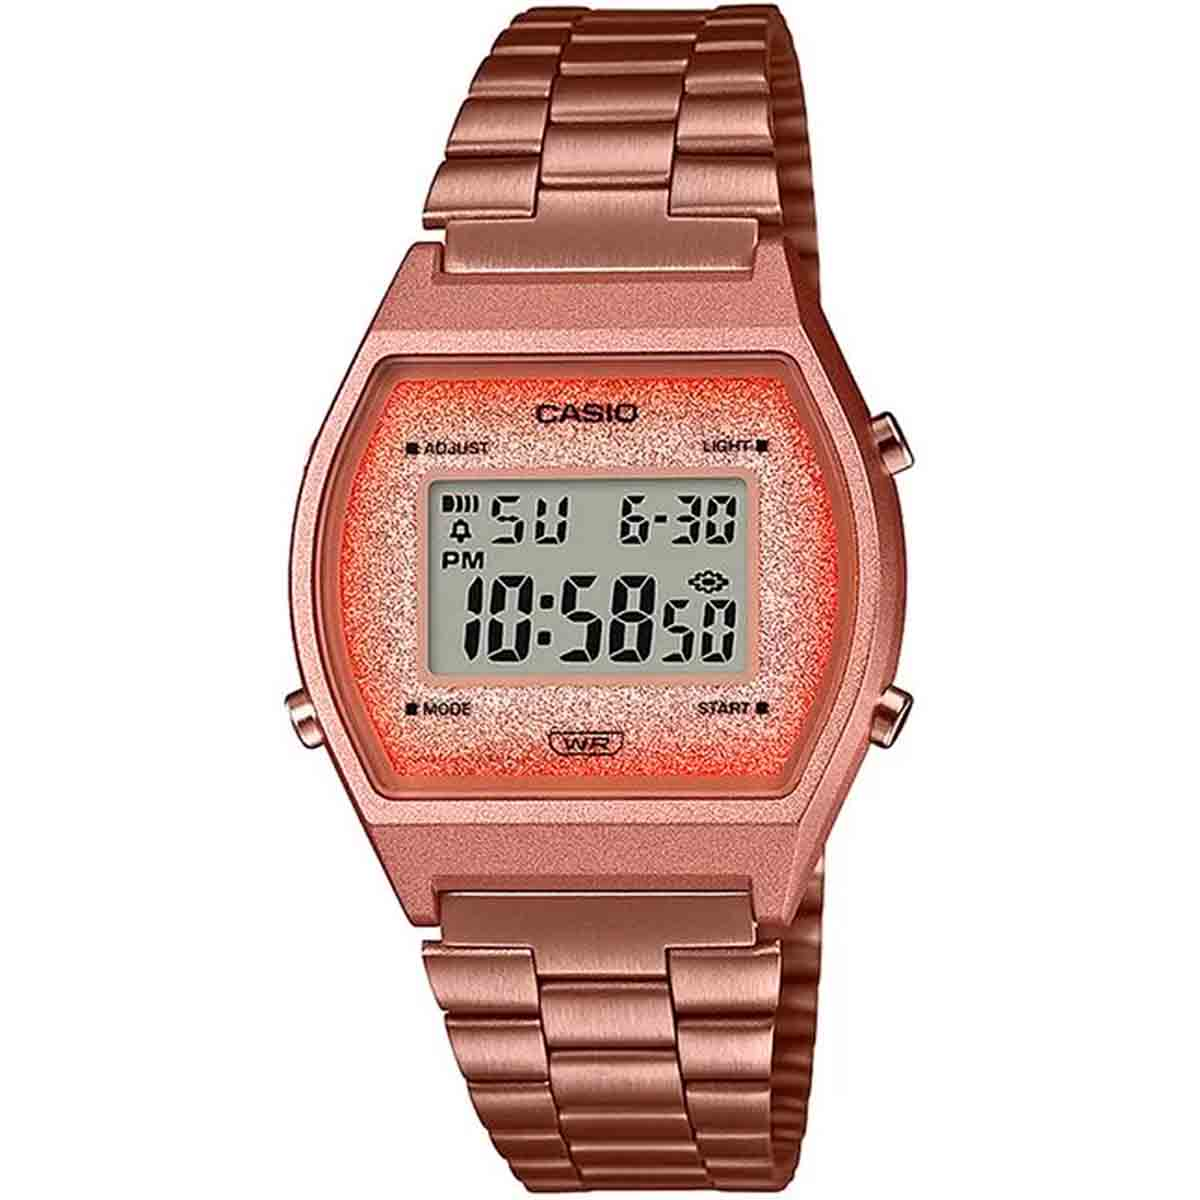 Relógio Casio Vintage Feminino Digital B640WCG-5DF